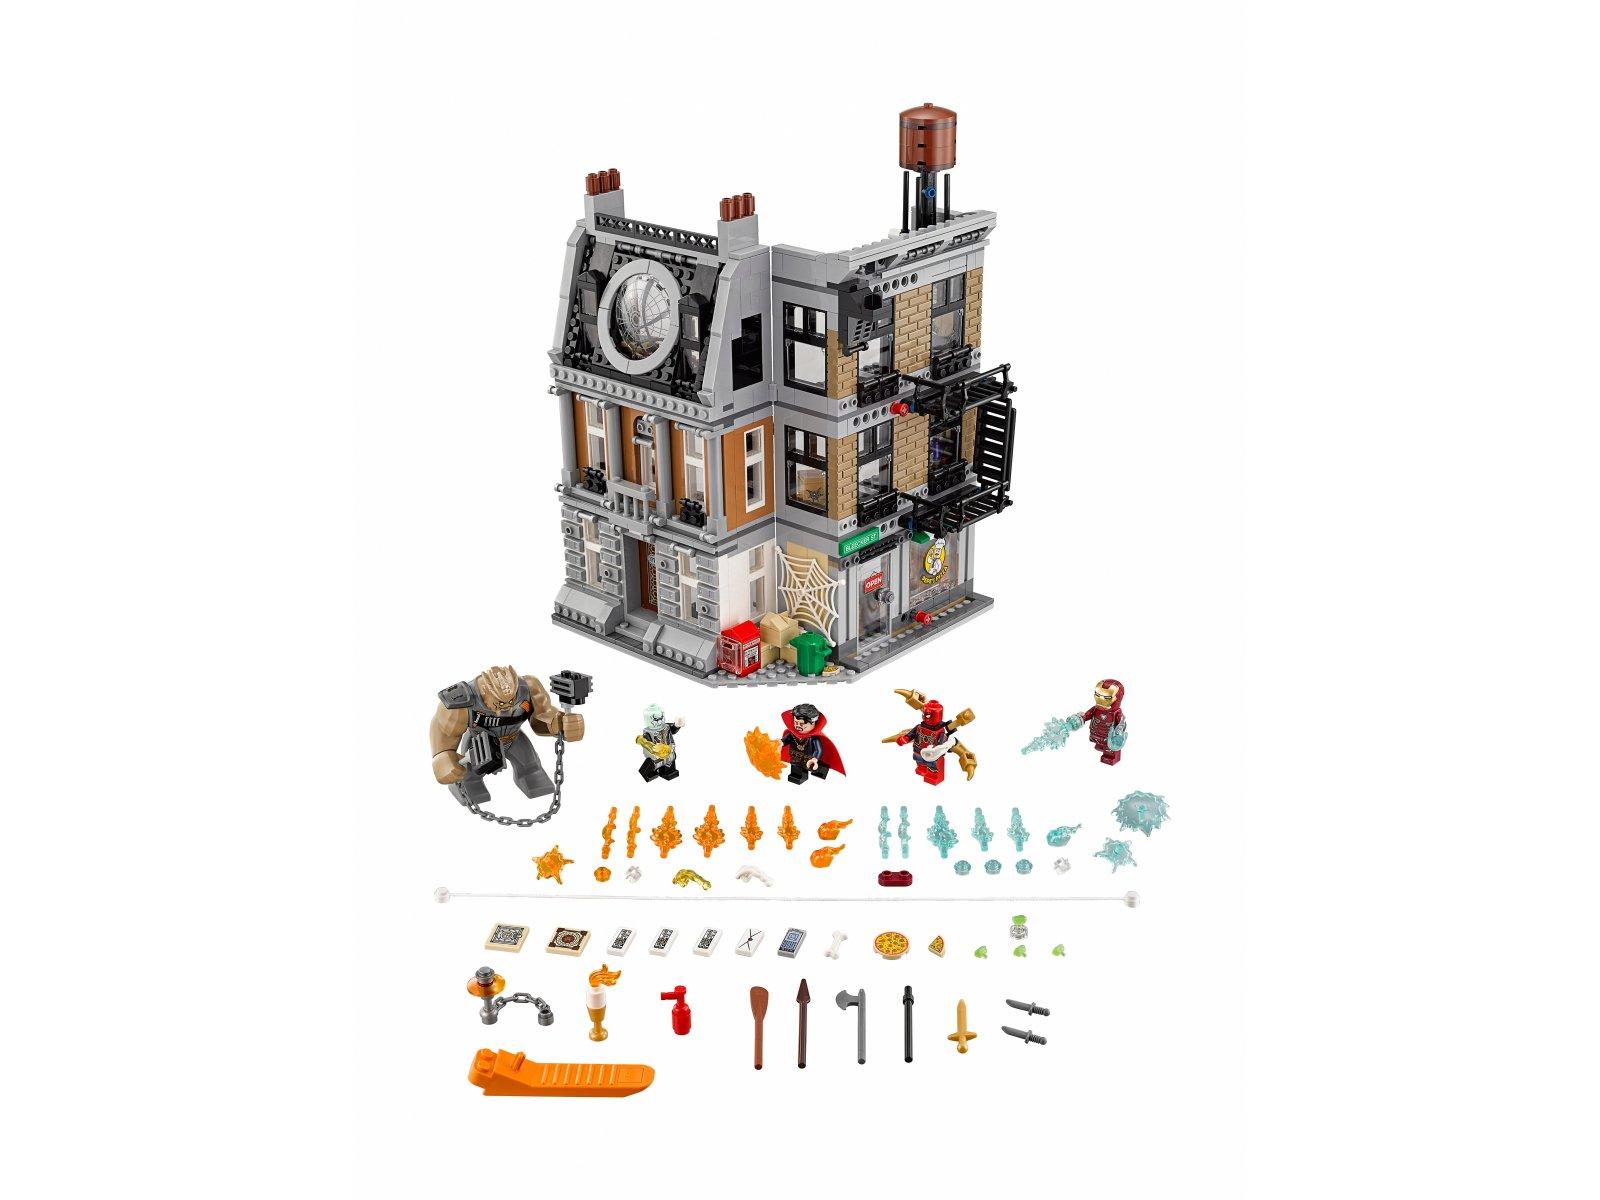 LEGO 76108 Marvel Super Heroes Starcie w Sanctum Sanctorum